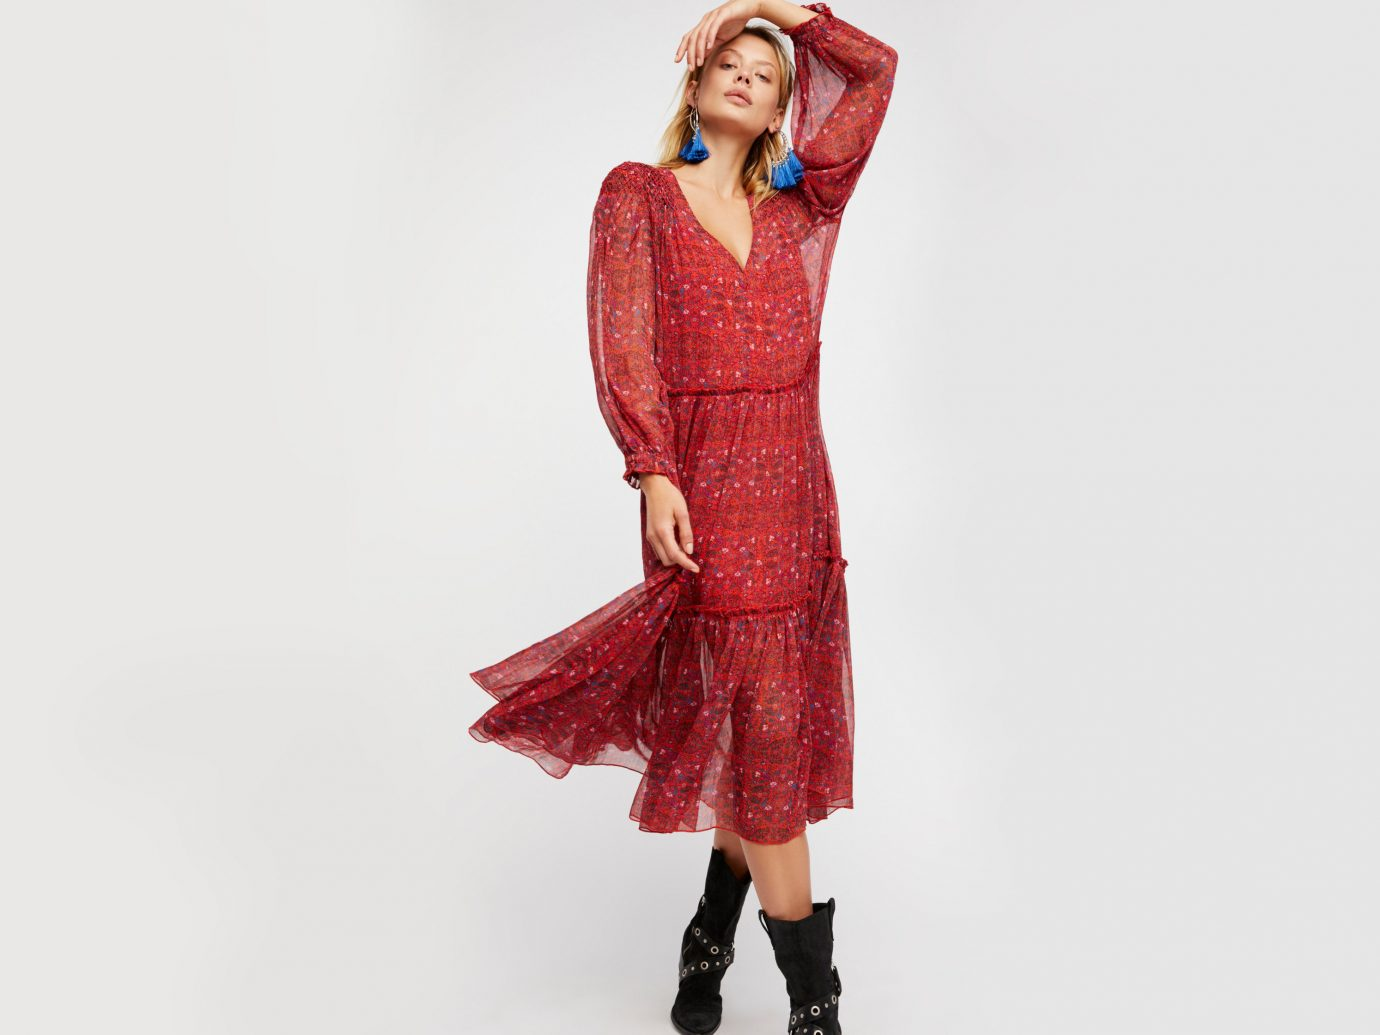 Style + Design clothing fashion model woman dress day dress wearing outerwear fashion neck sleeve lady fashion design dressed